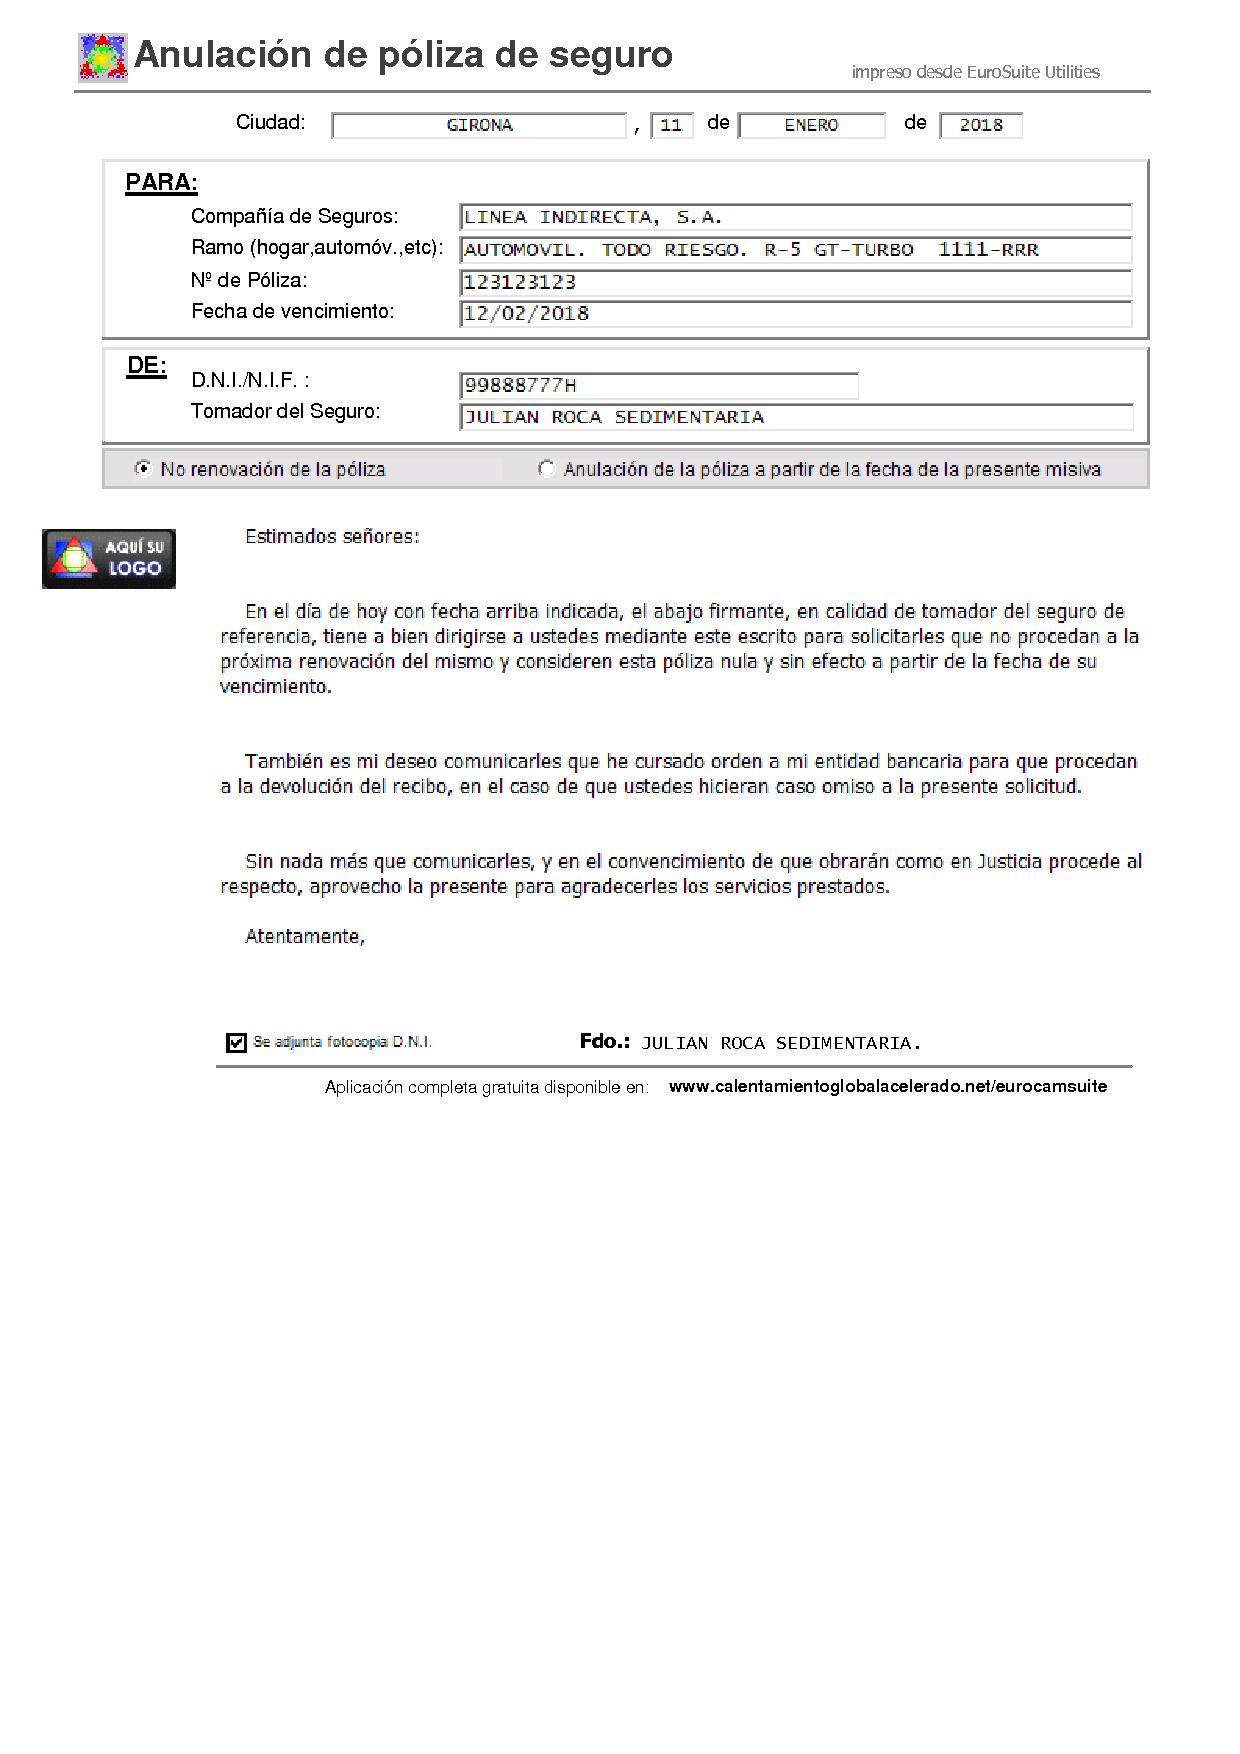 APLICACION ANULAR POLIZA SEGURO - Web oficial de EUROSUITE UTILITIES